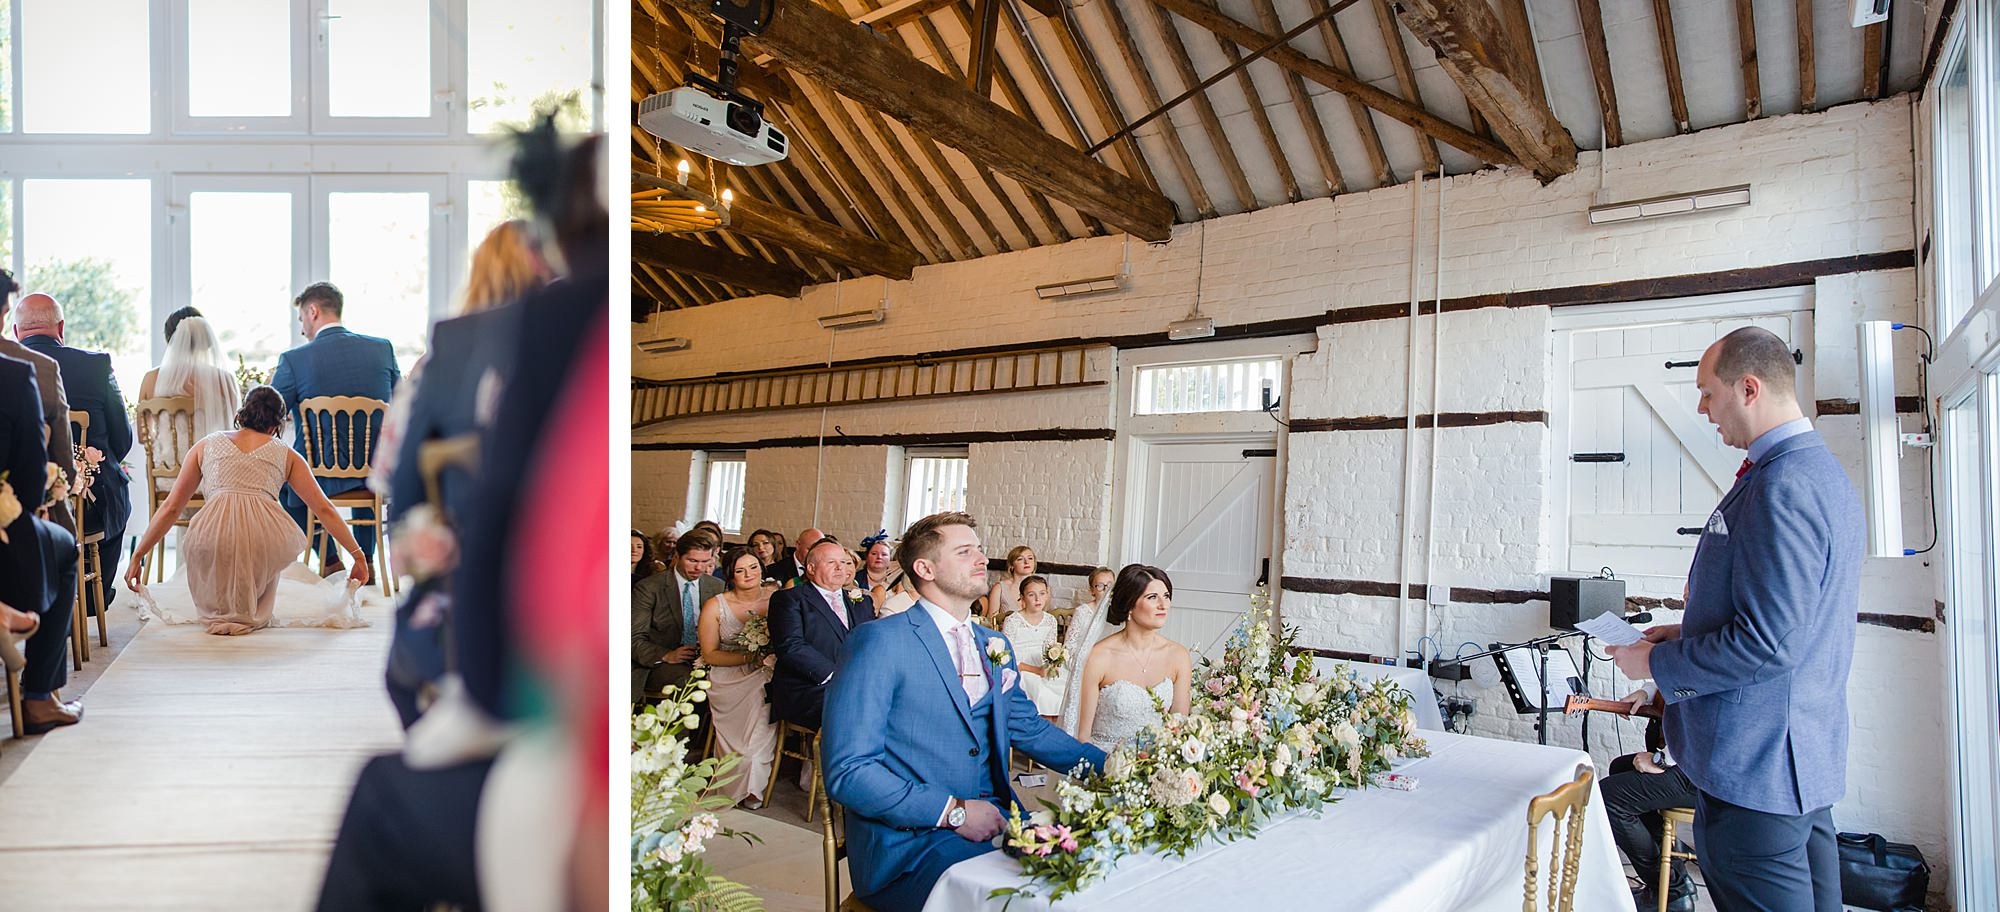 Lillibrooke Manor wedding ceremony